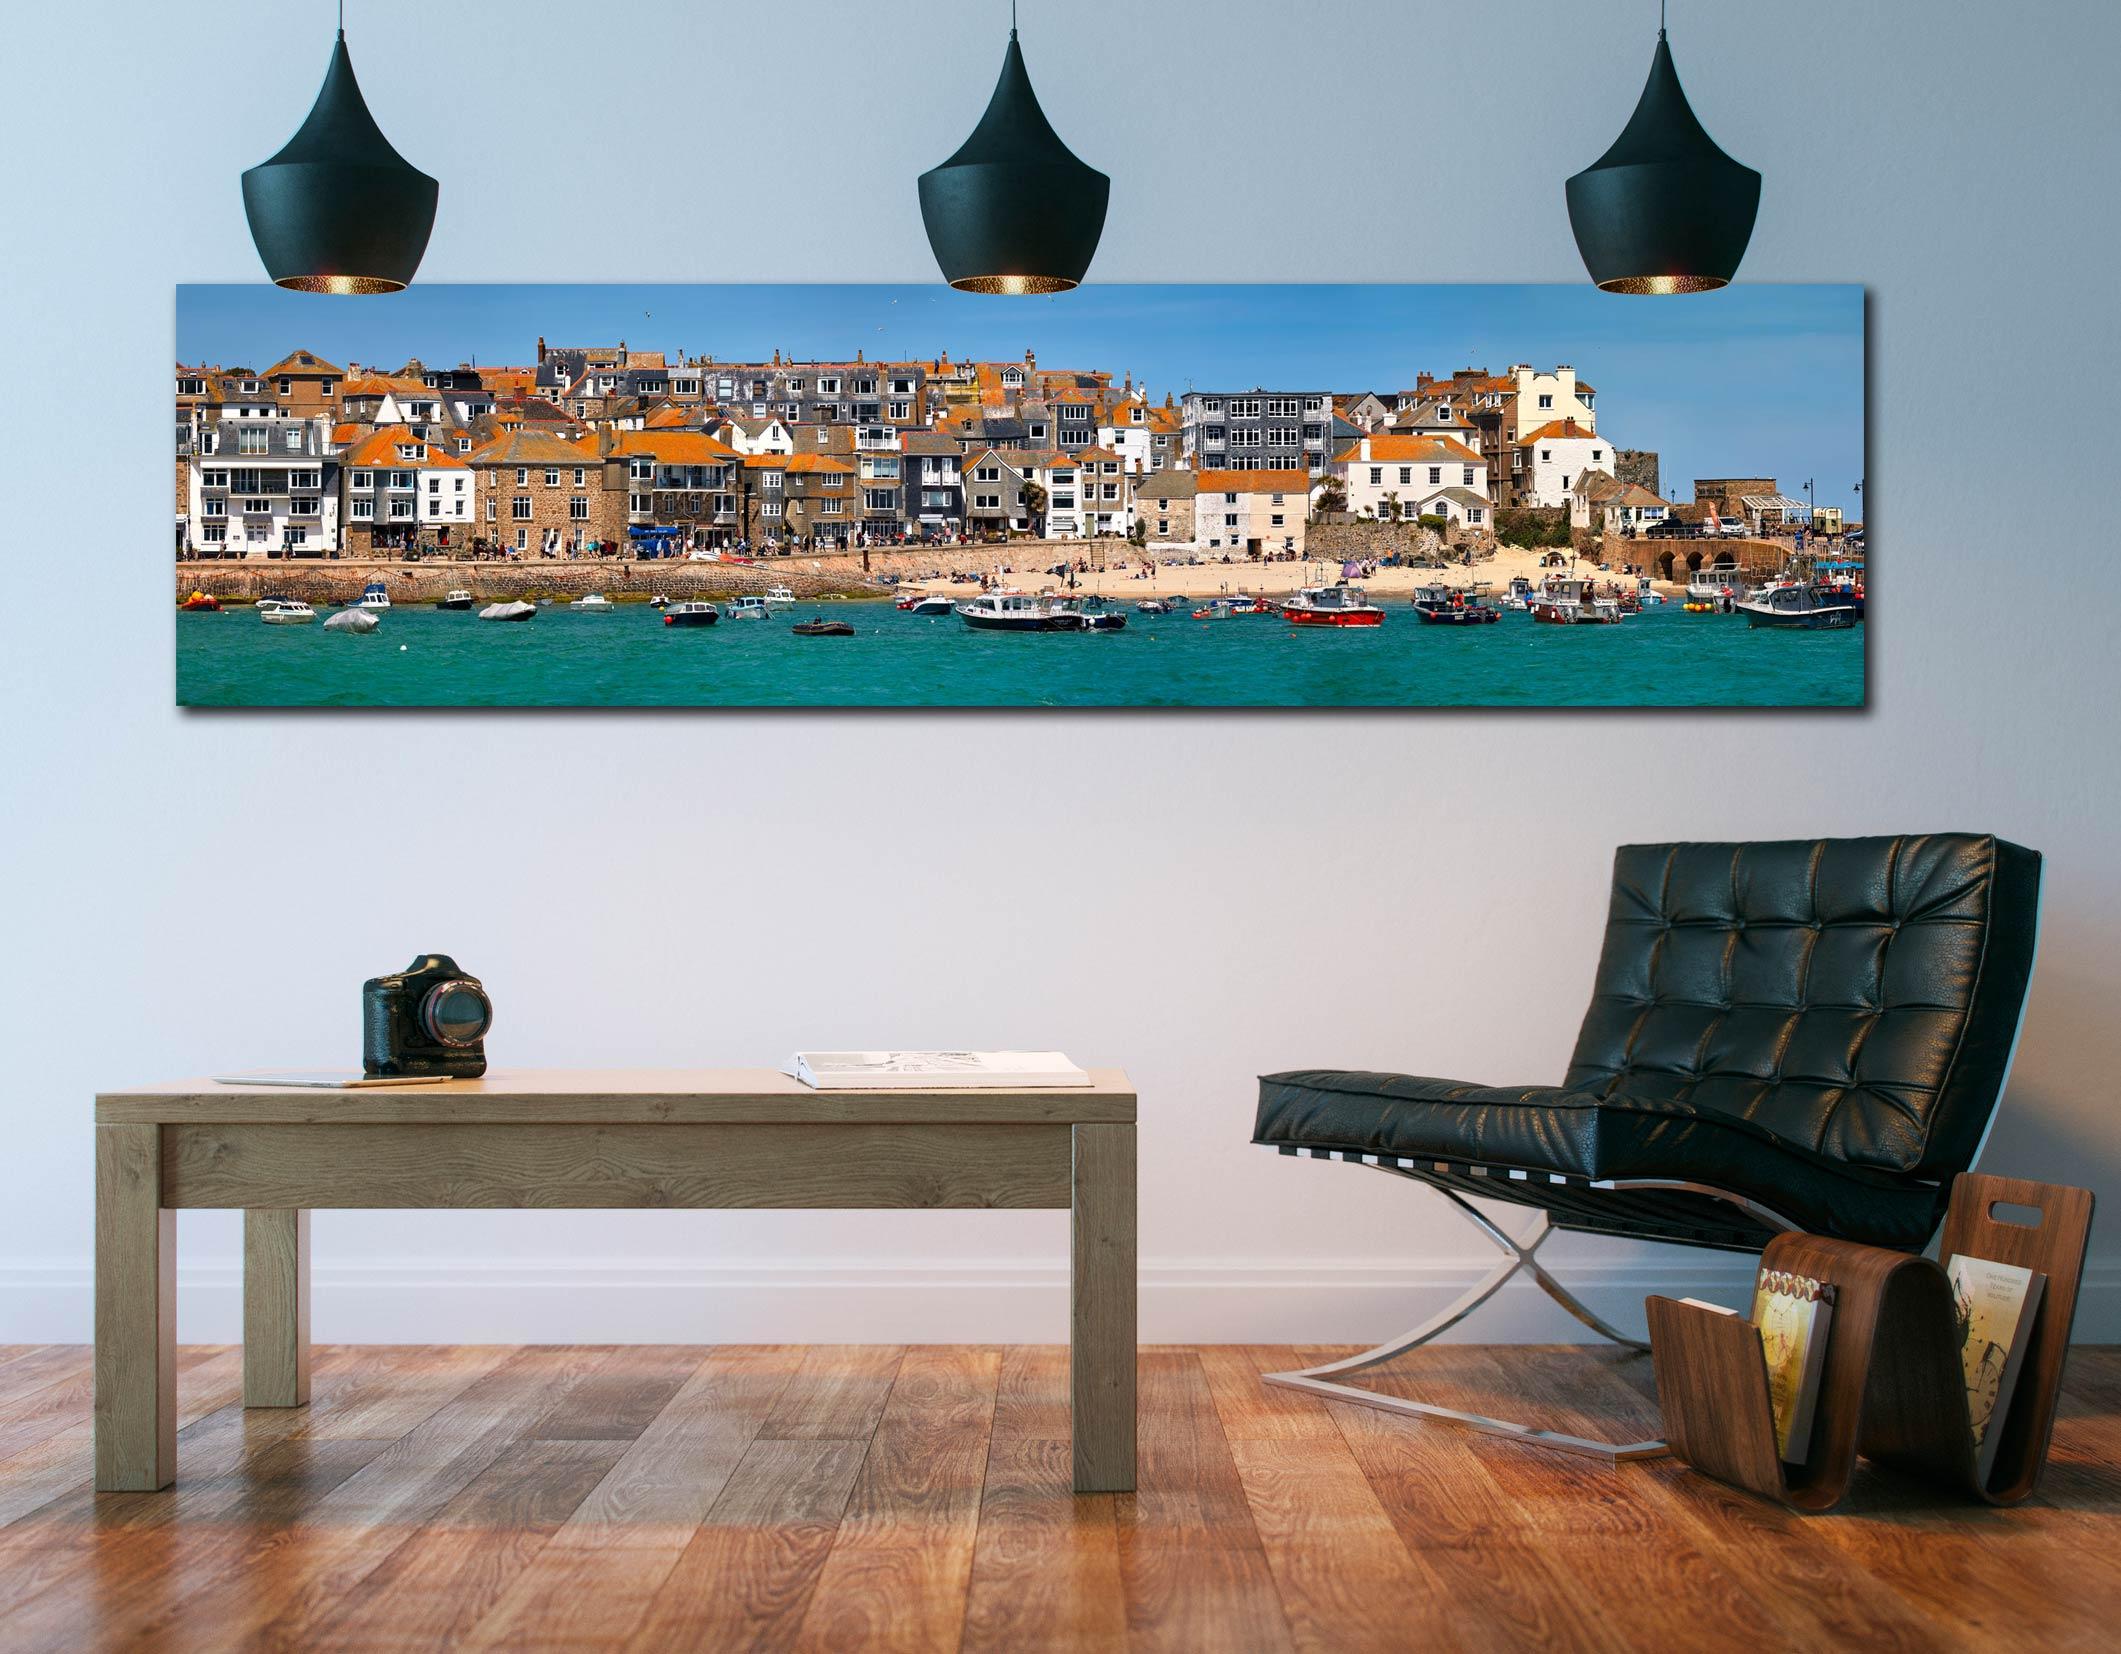 Wharf Road and Downalong - Print Aluminium Backing With Acrylic Glazing on Wall